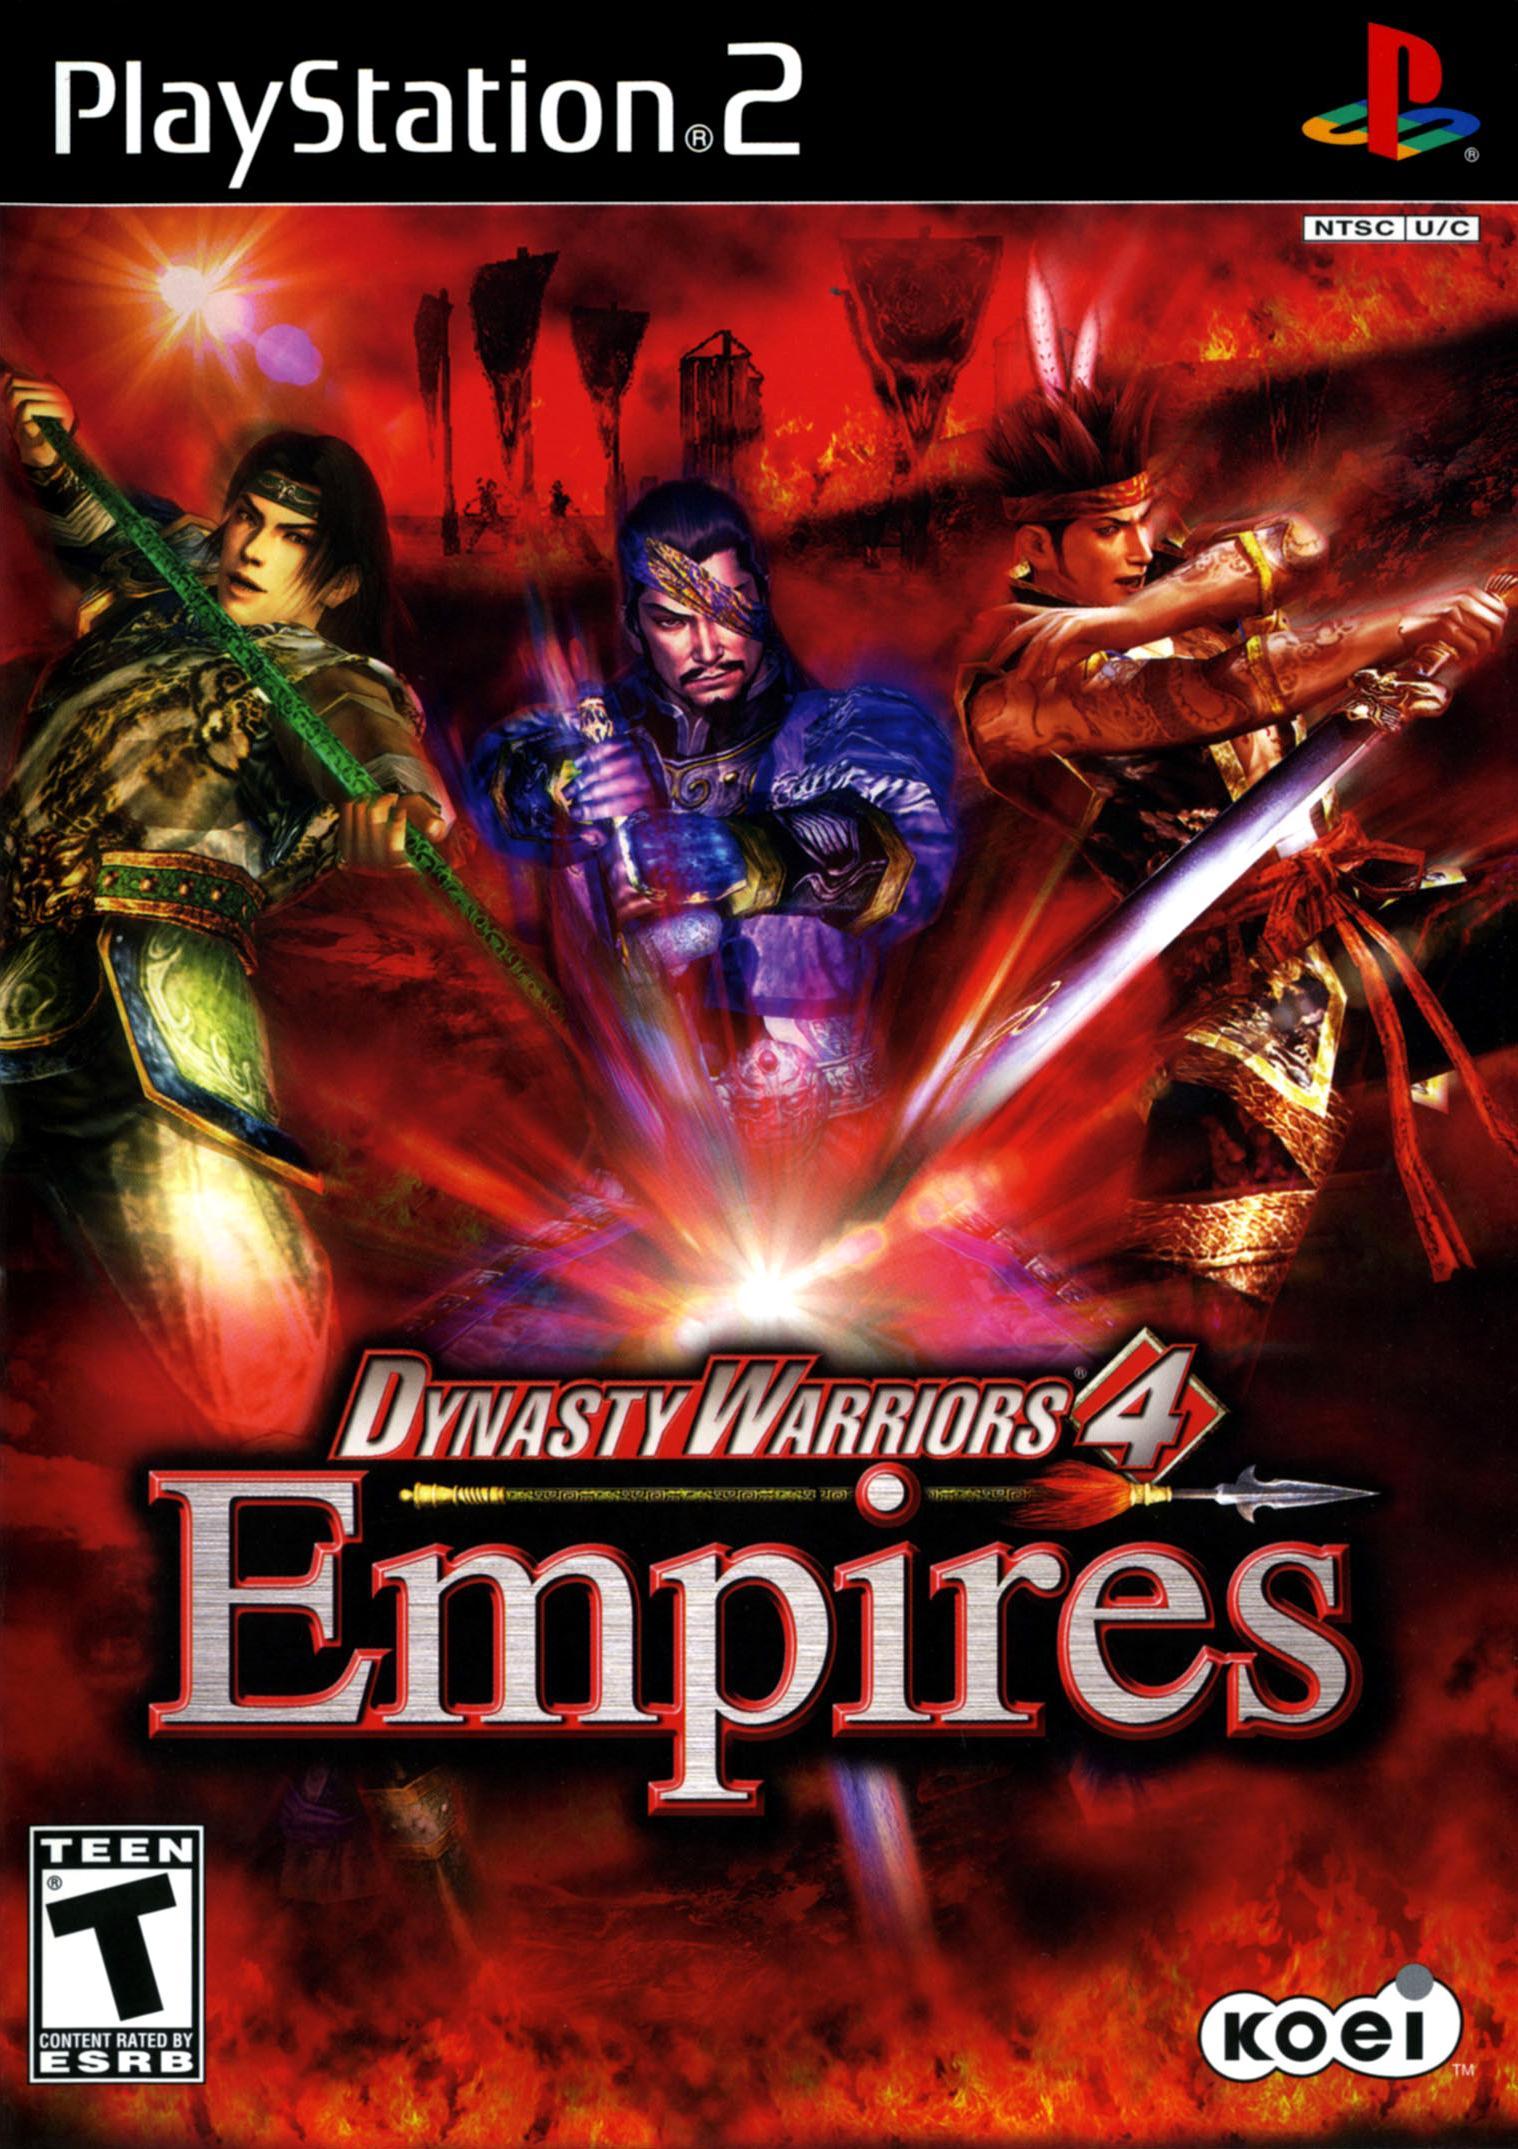 Dynasty Warriors 4: Empires